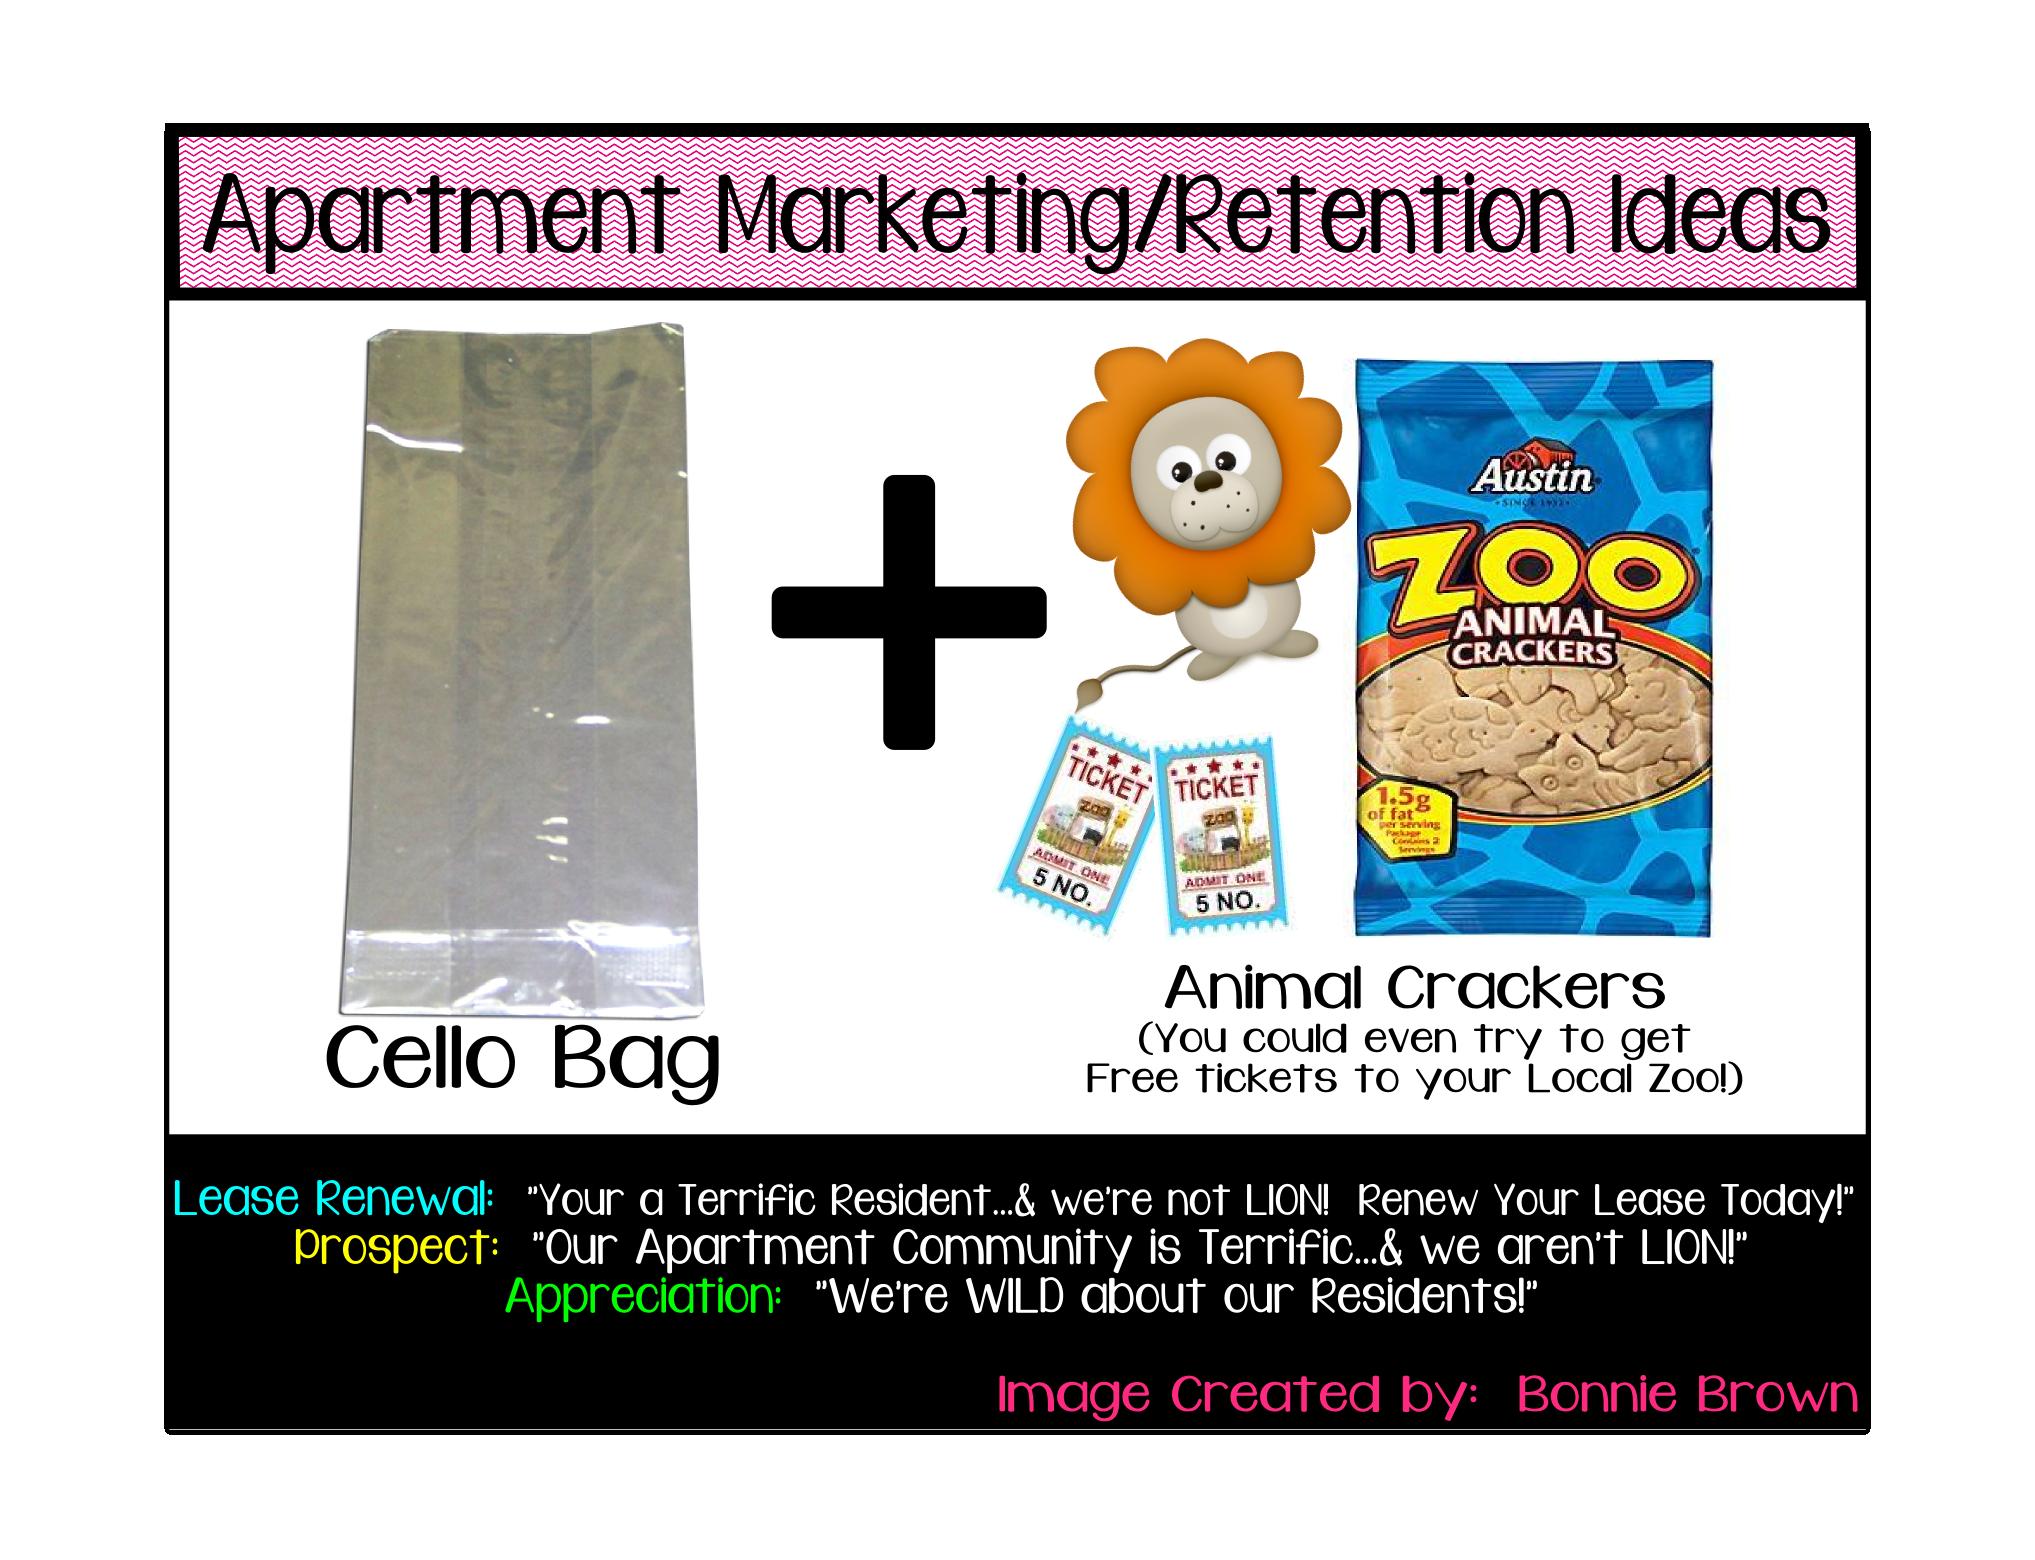 Inexpensive Housewarming Gifts Apartment Marketing Retention Ideas Marketing Ideas